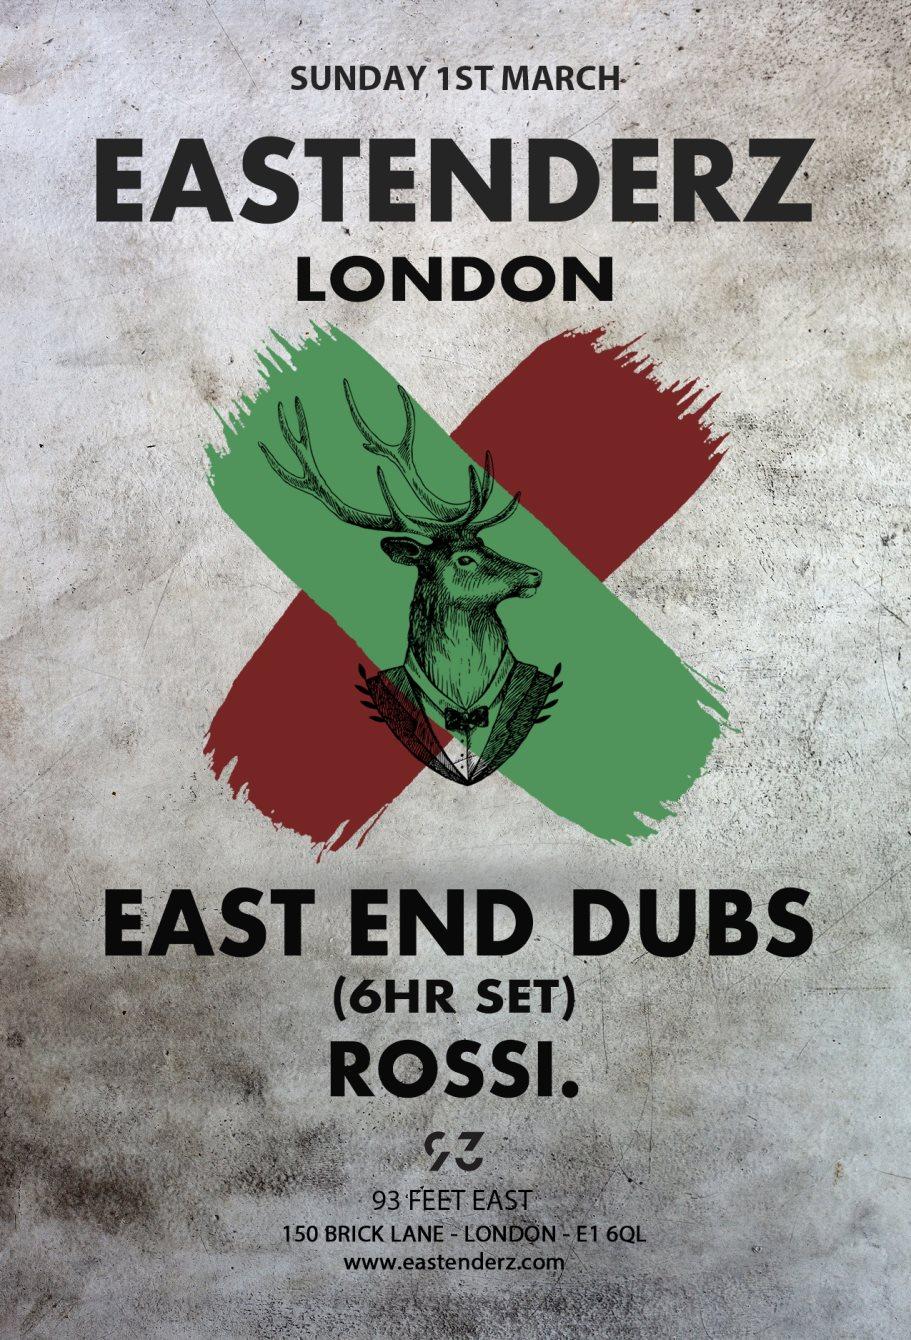 [Sold Out] Eastenderz - London (East End Dubs 6hr Set!) - Flyer front